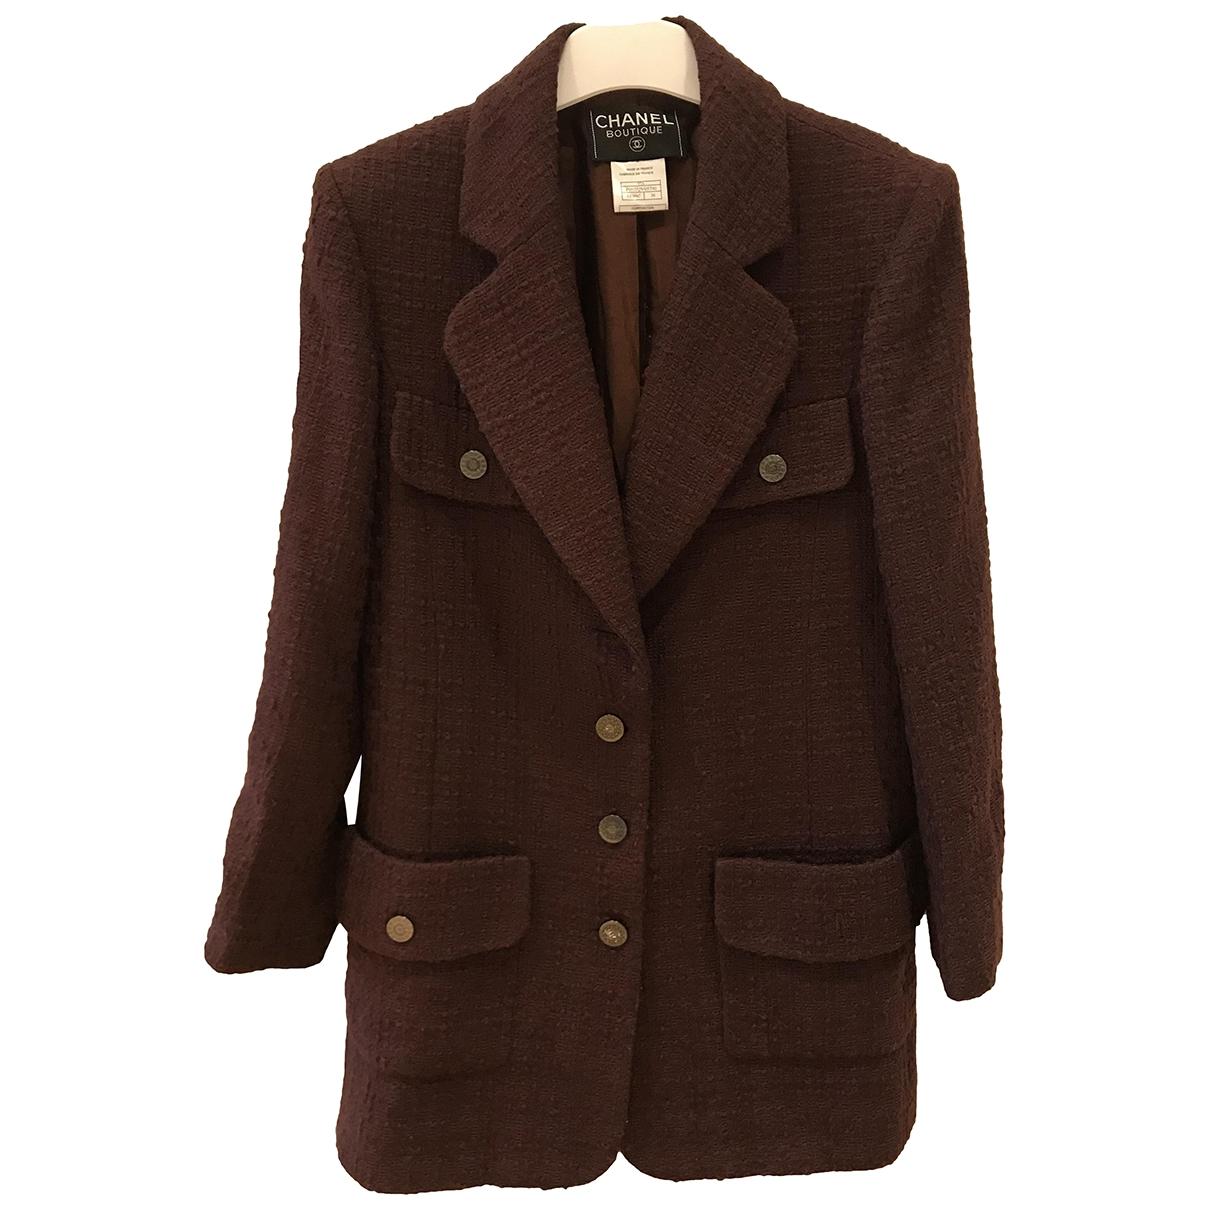 Chanel \N Burgundy Tweed jacket for Women 38 FR